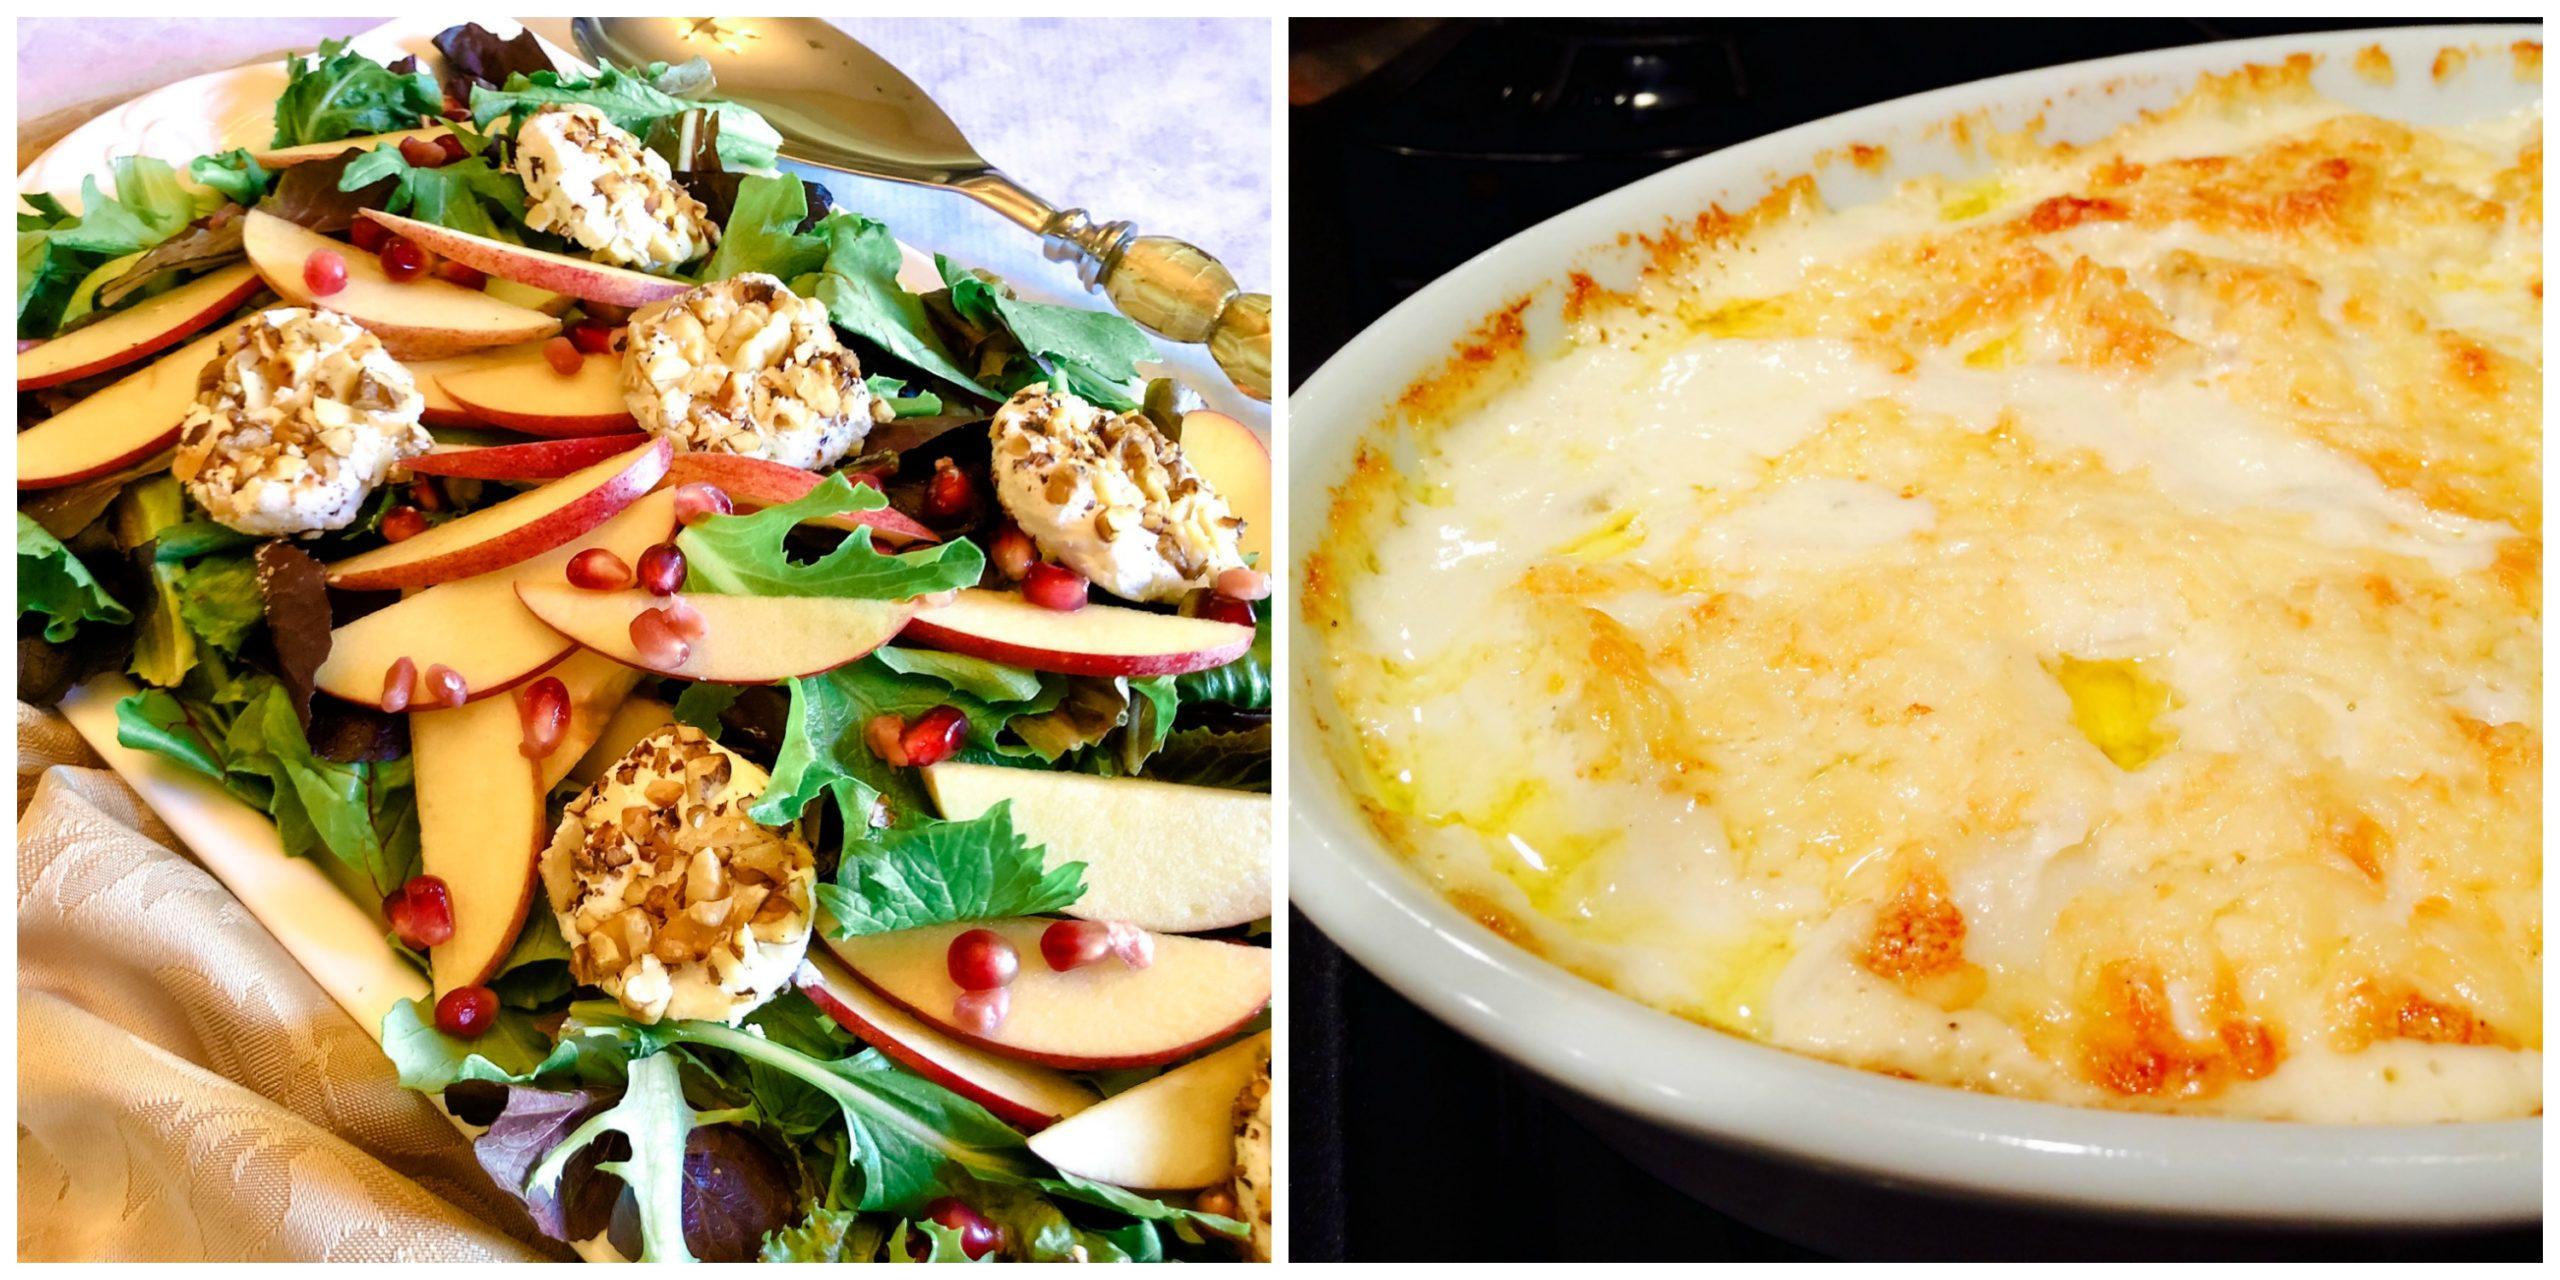 Mixed Greens Salad and Potatoes Au Gratin